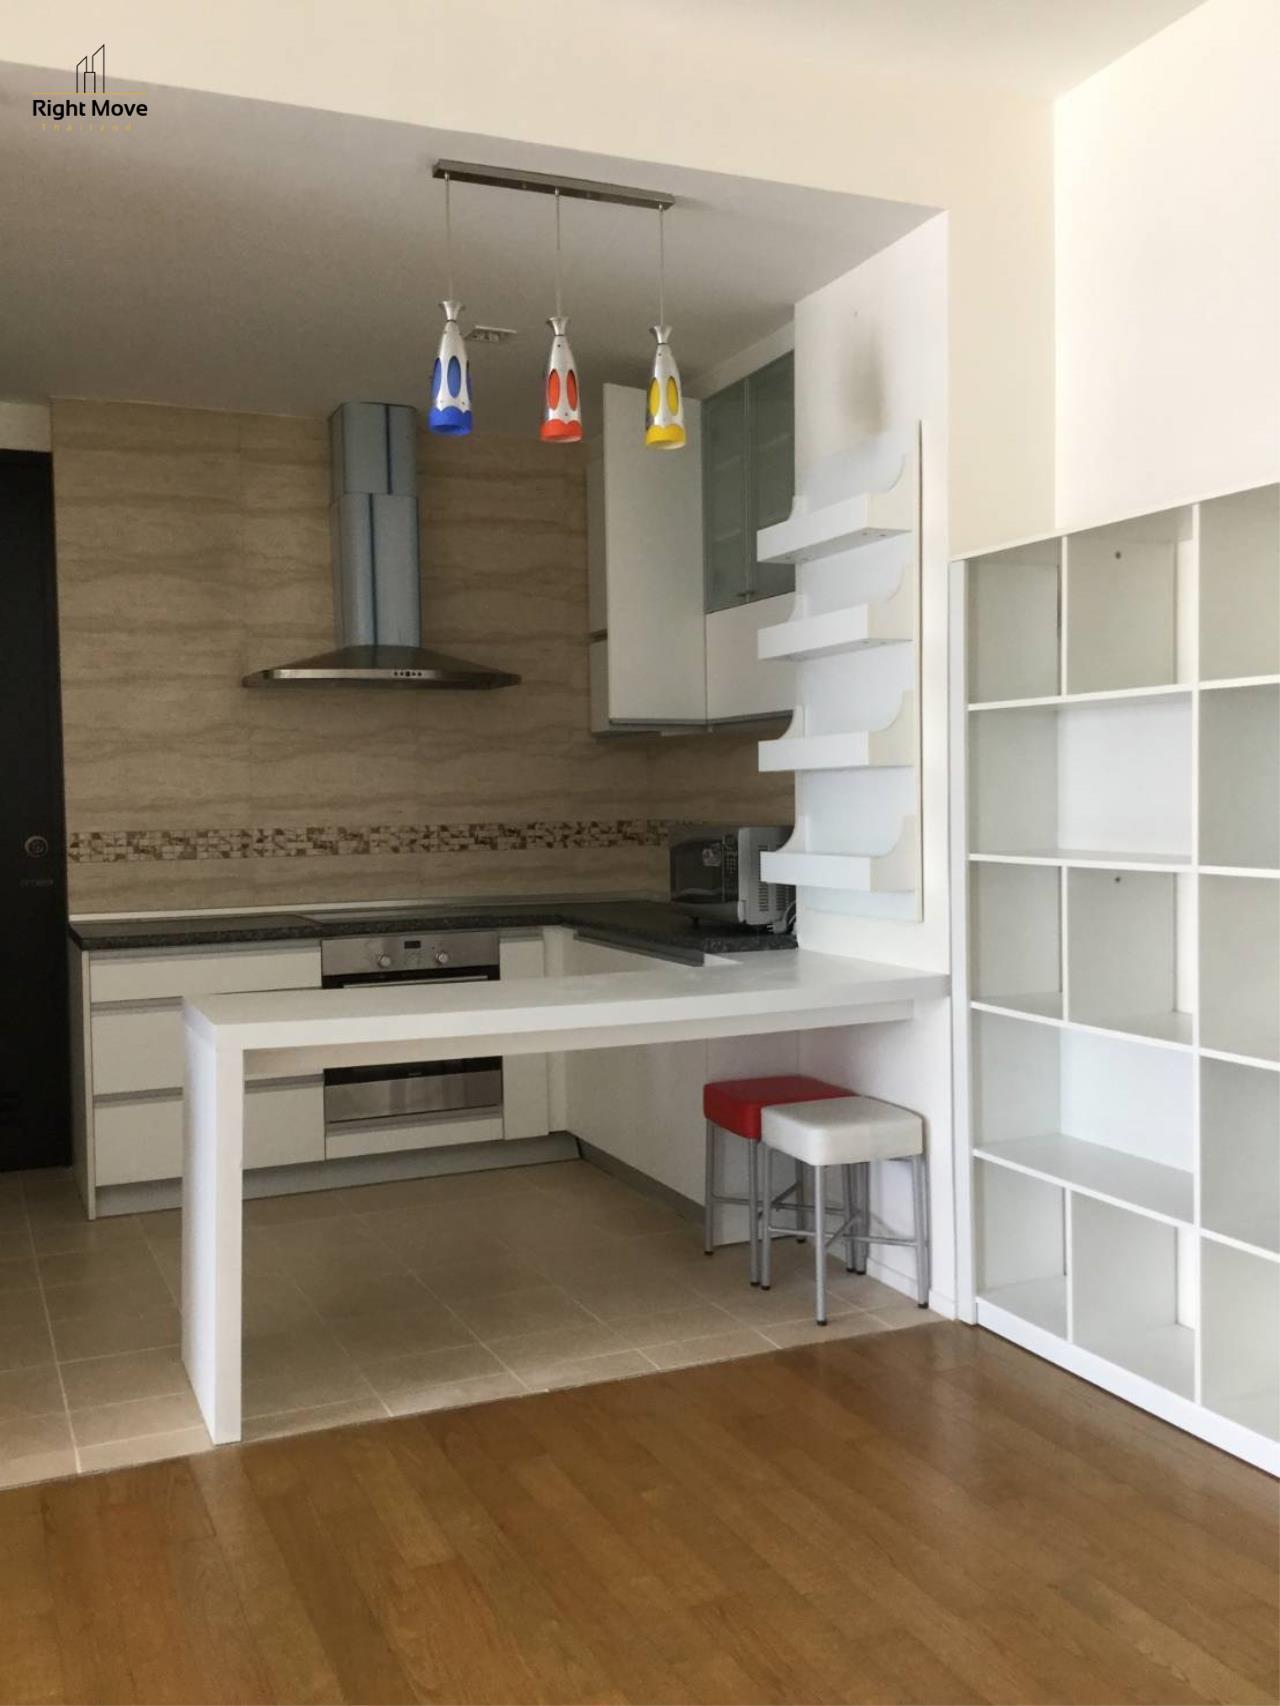 Right Move Thailand Agency's CA5486 Madison Condominium For Rent 90,000 THB - 3 Bedrooms - 160 sqm. 5